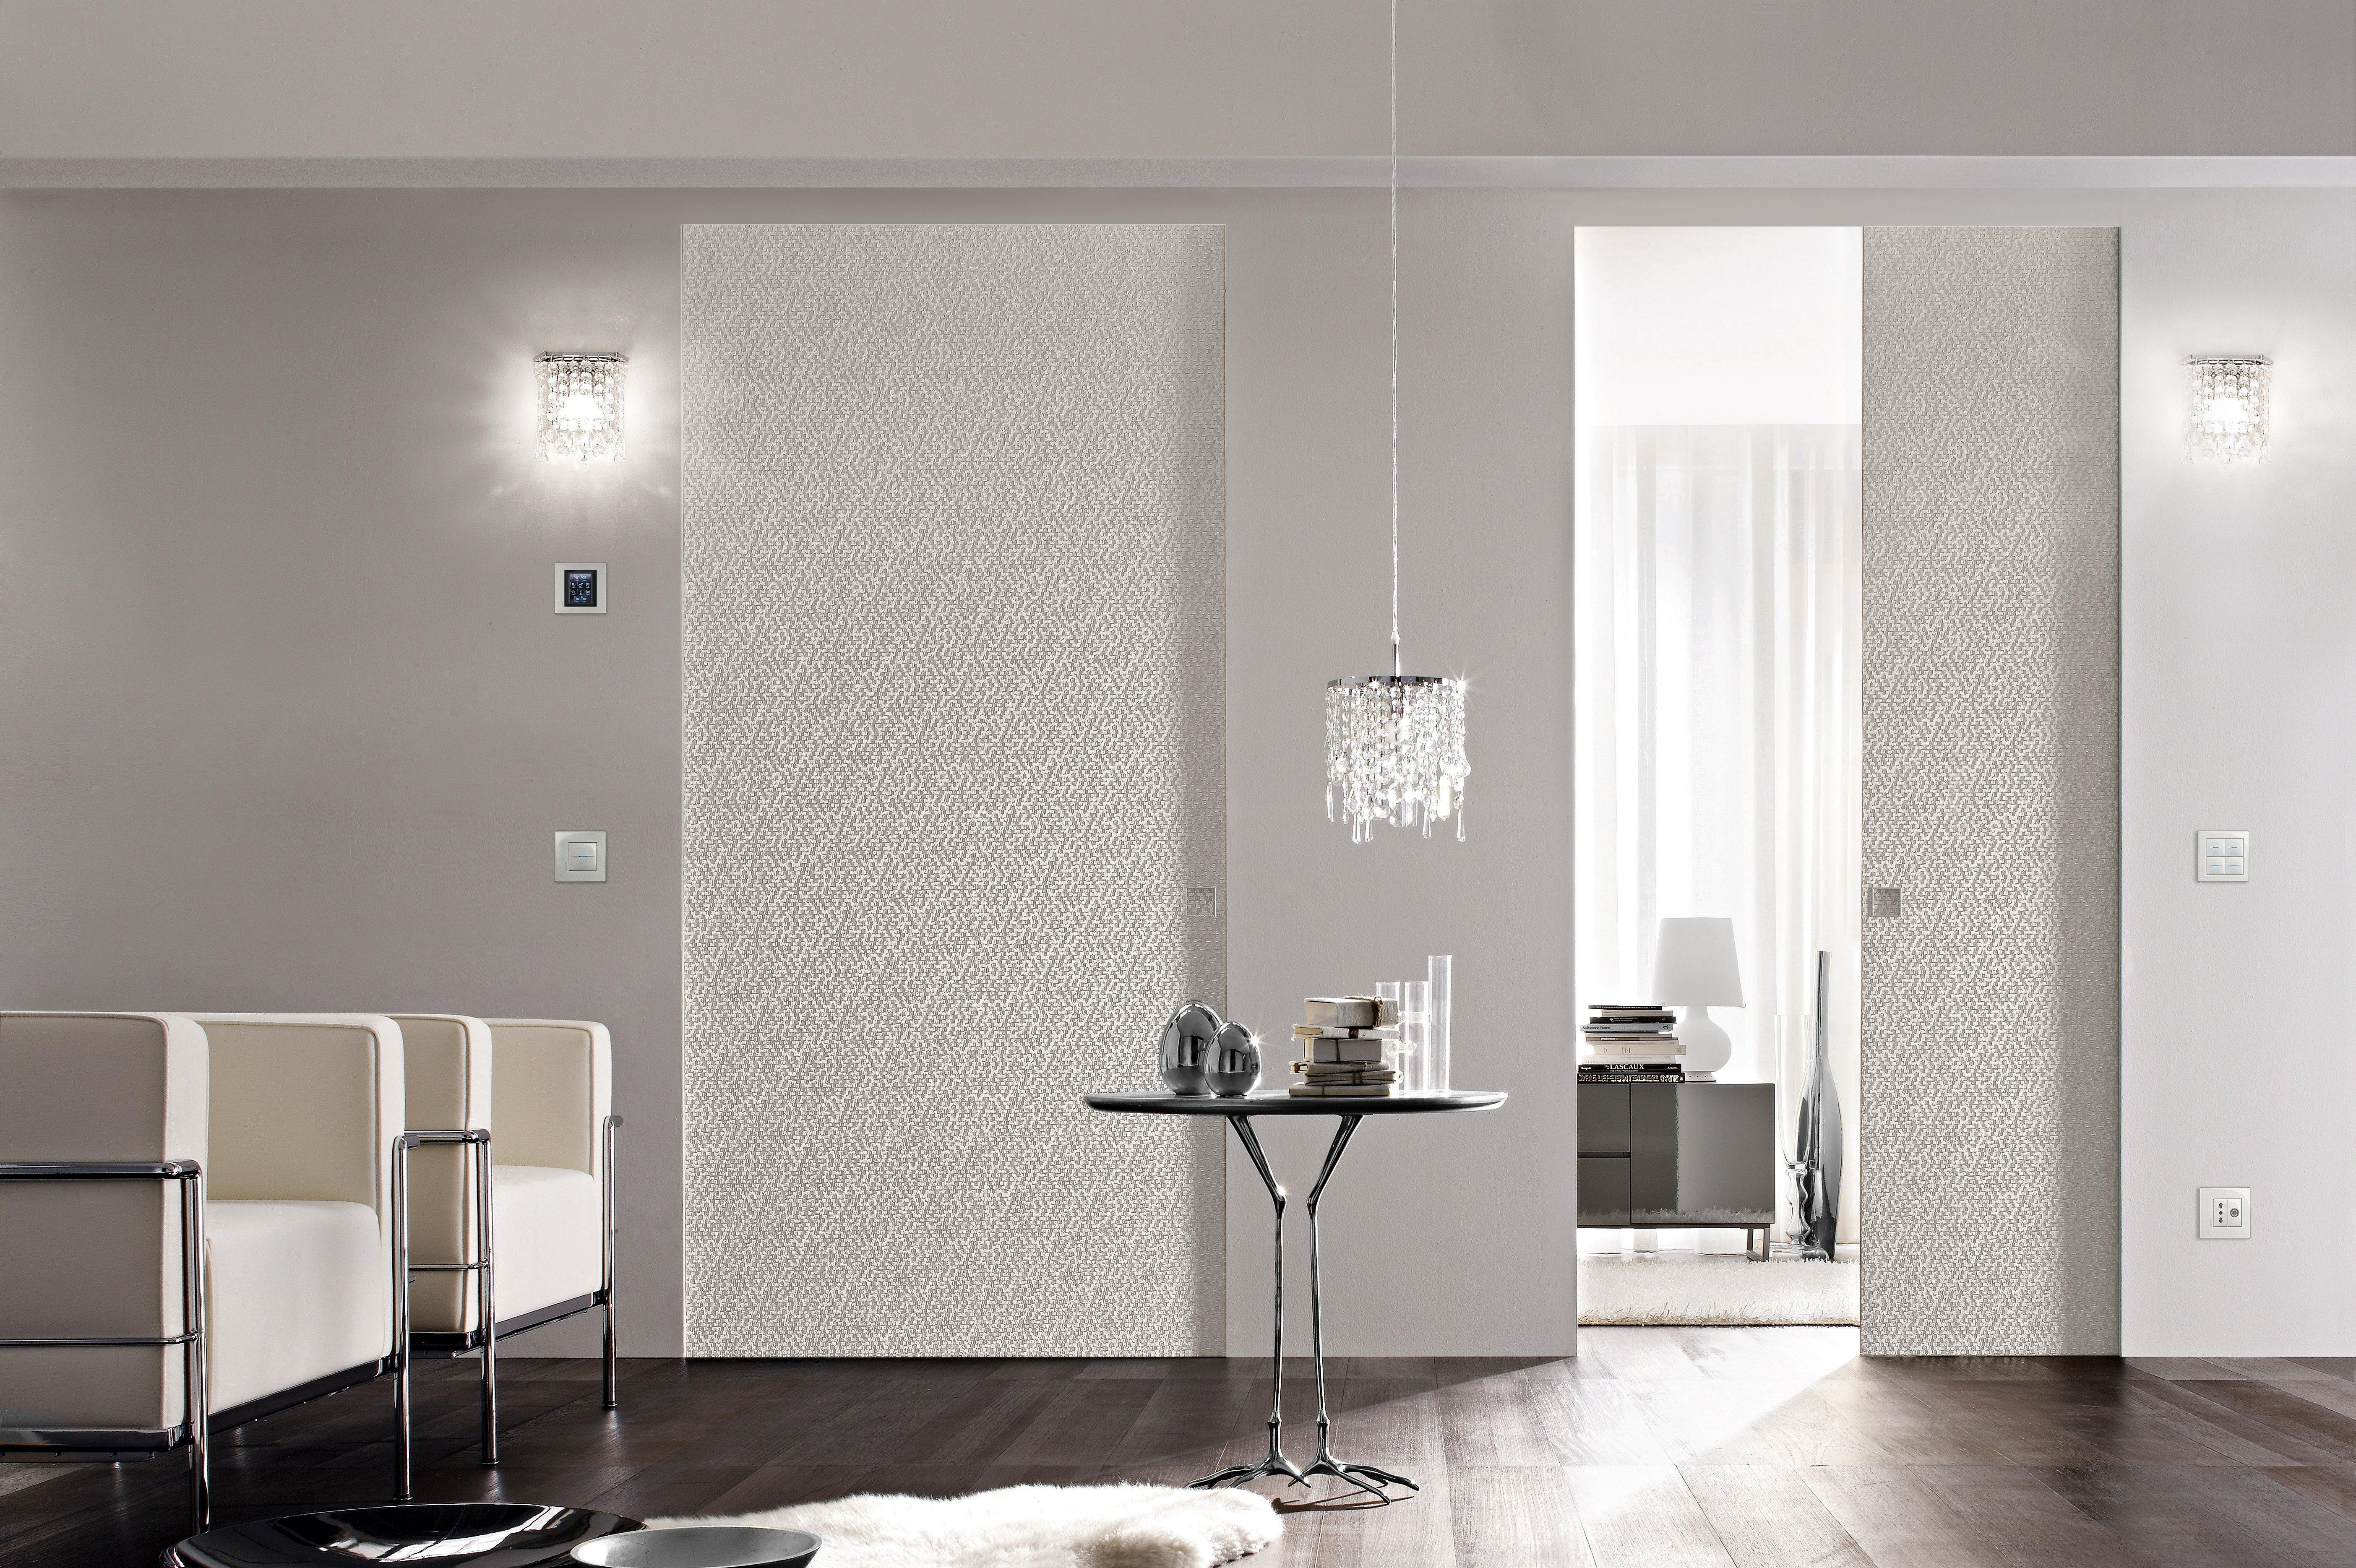 Illuminazione Cartongesso Design Cucina: Aiuto per layout cucina ...